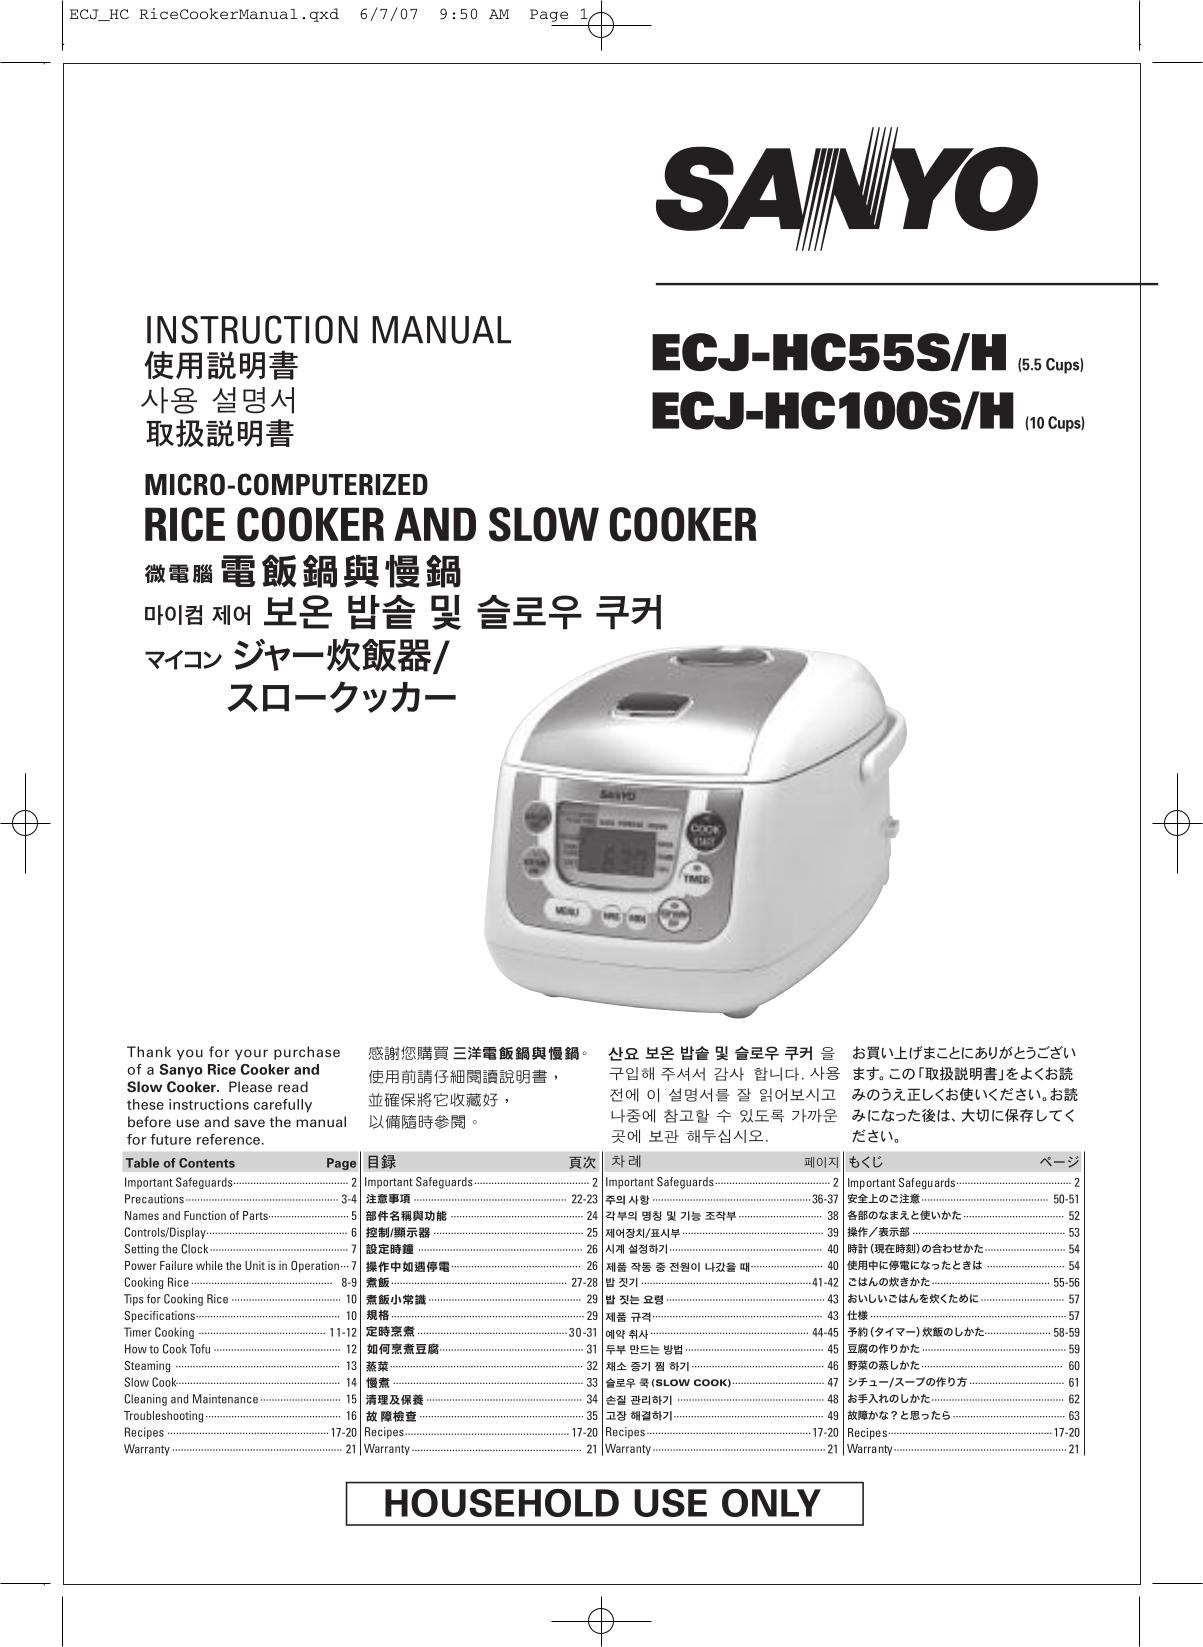 download free pdf for sanyo ecj d100s rice cookers other manual rh umlib com sanyo ec-5 rice cooker manual sanyo rice cooker manual ecj-d55s